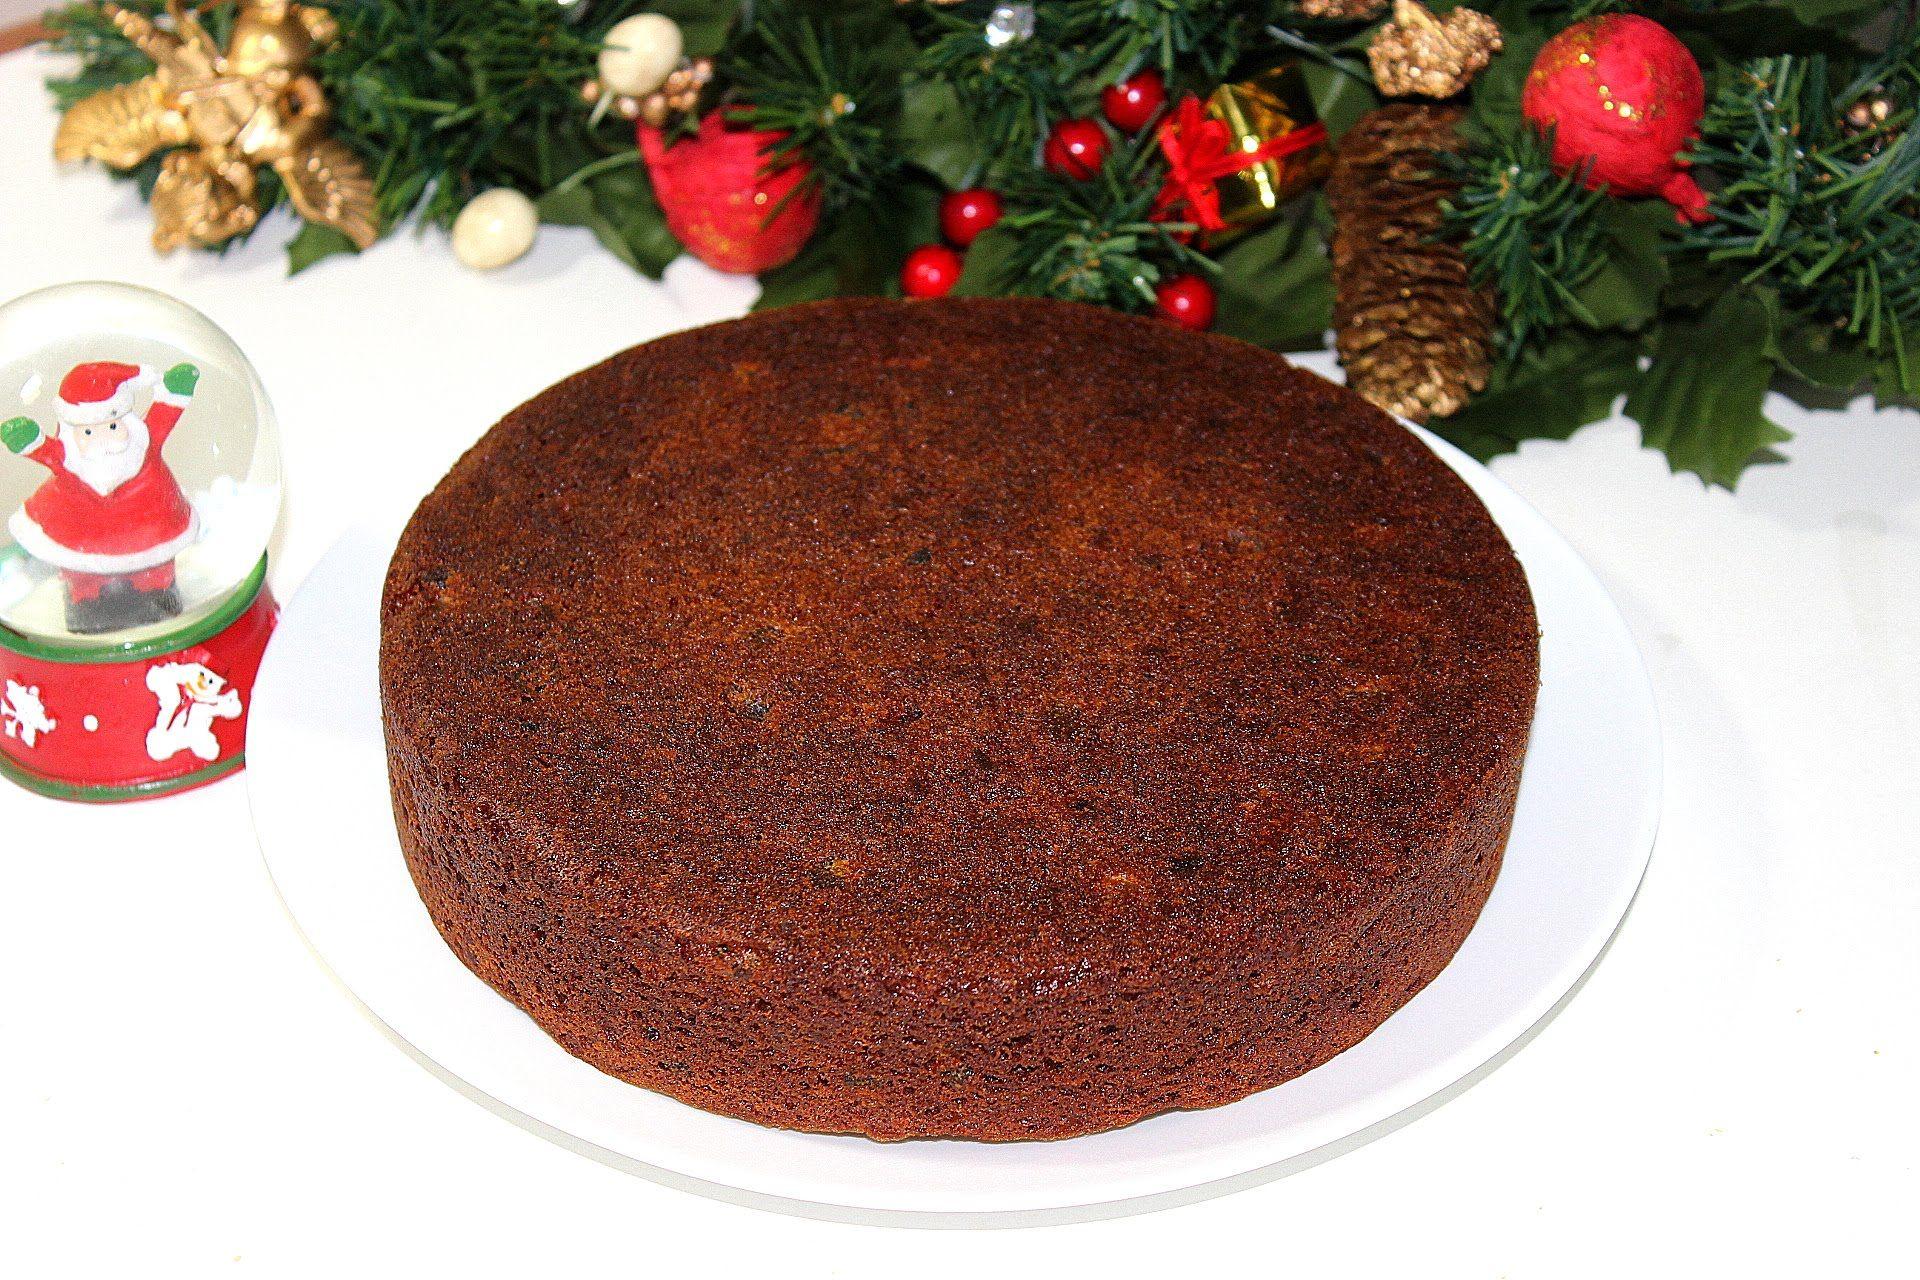 Christmas Fruit Cake Kerala Plum Cake With Wine Xmas Fruit Cake By Pacha Fruit Cake Christmas Plum Cake Fruit Cake